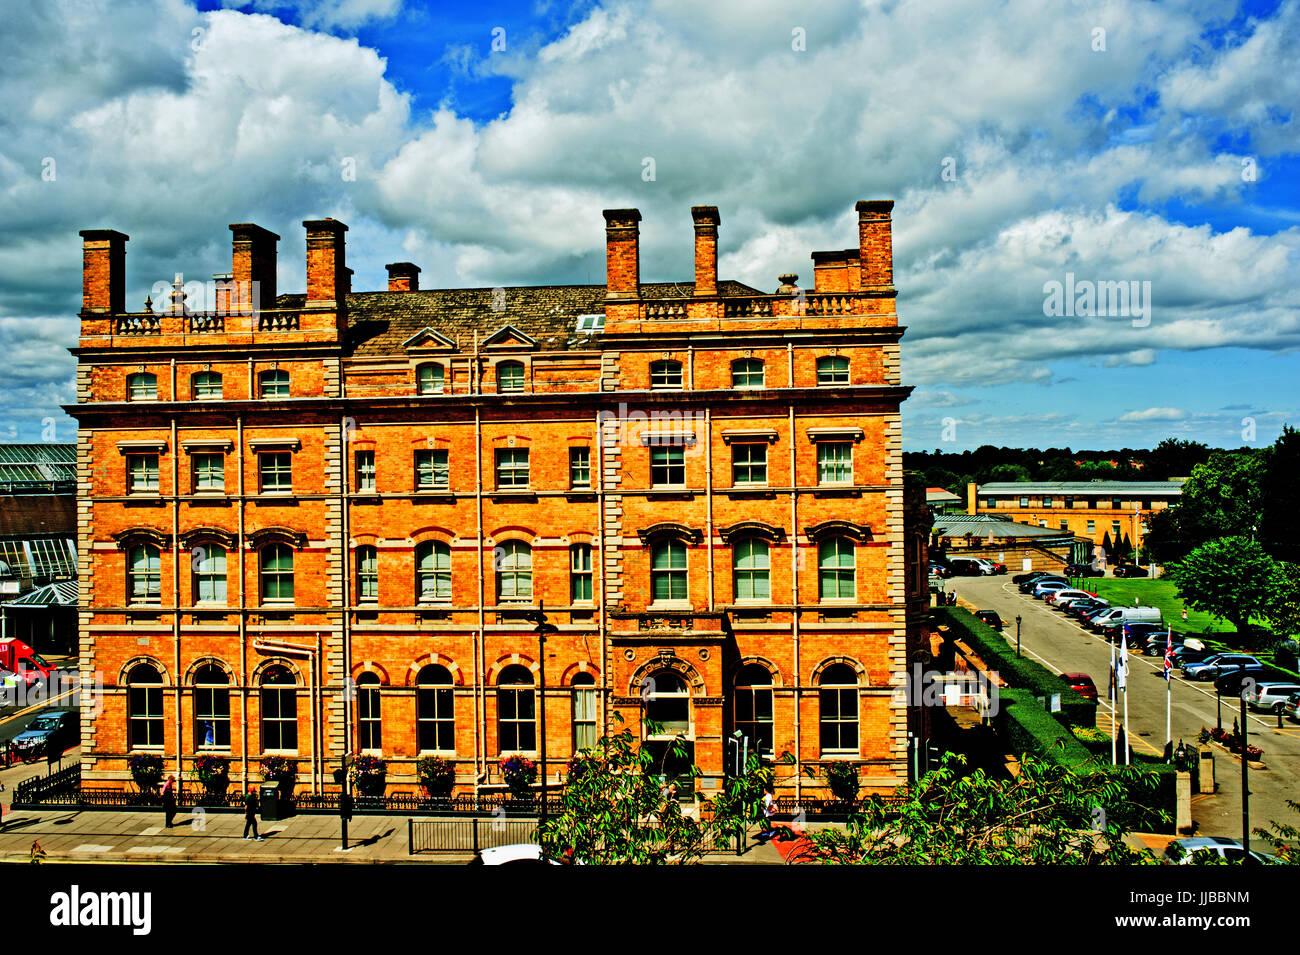 The Royal York Hotel, York - Stock Image